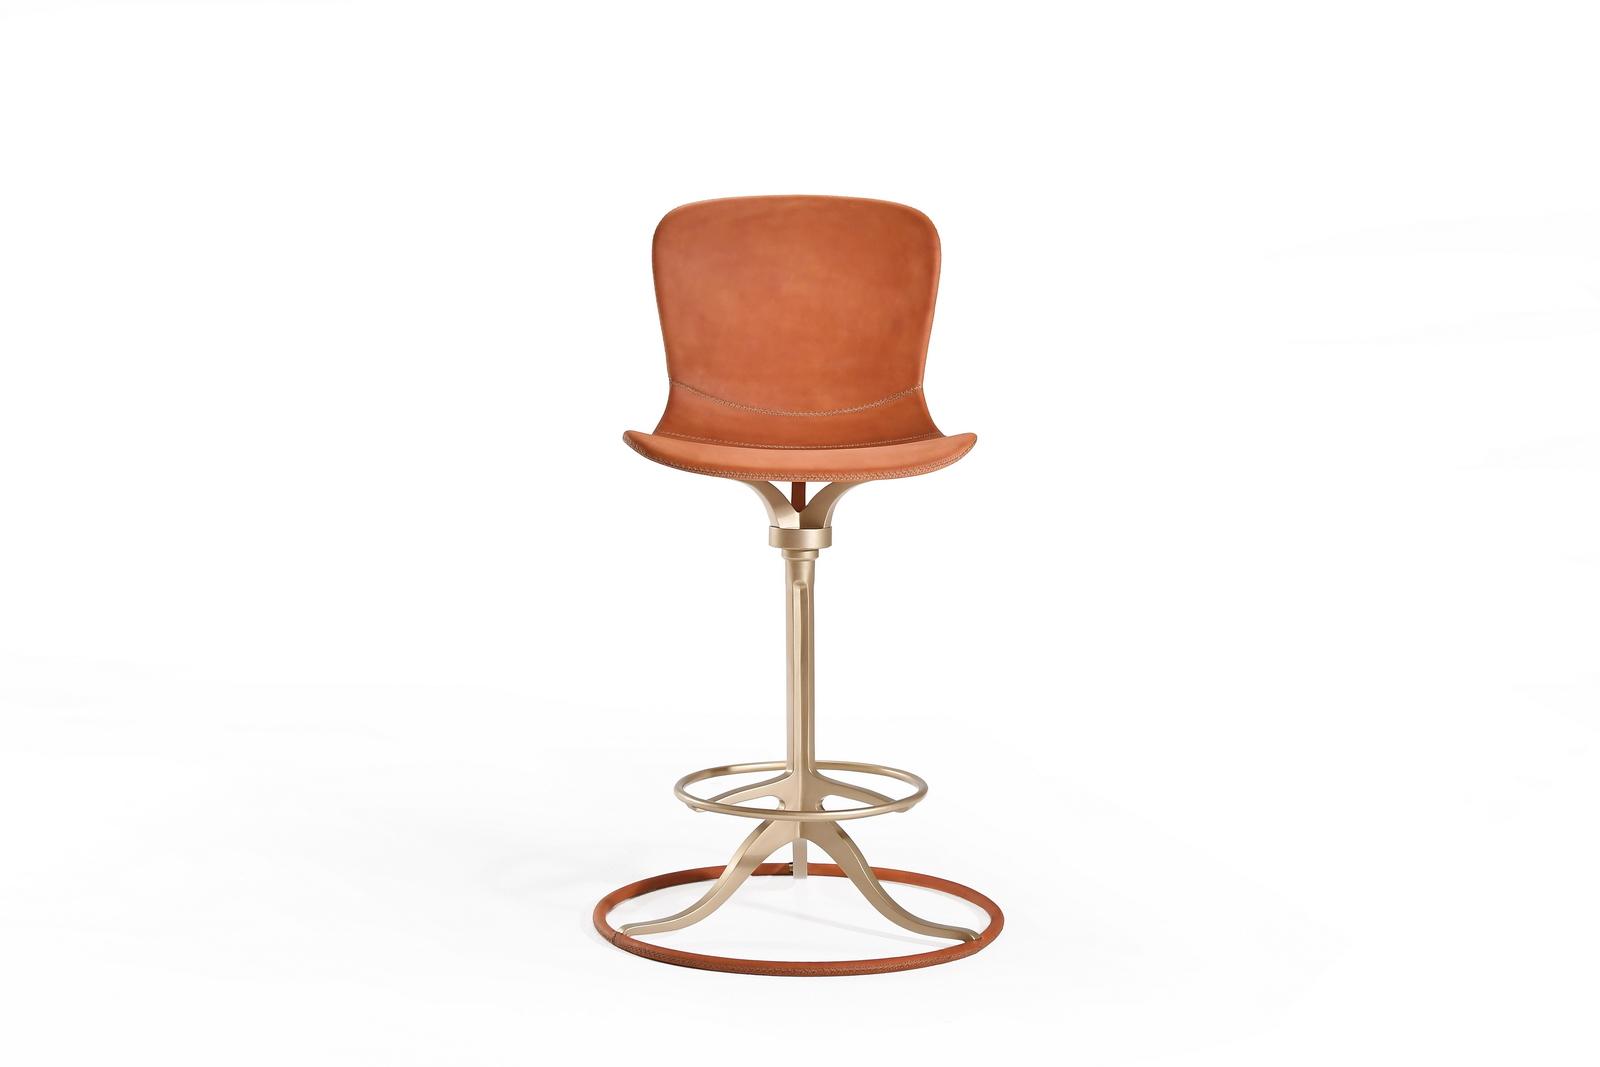 PTendercool-Chair-PT472-BS1-LB-210325-01